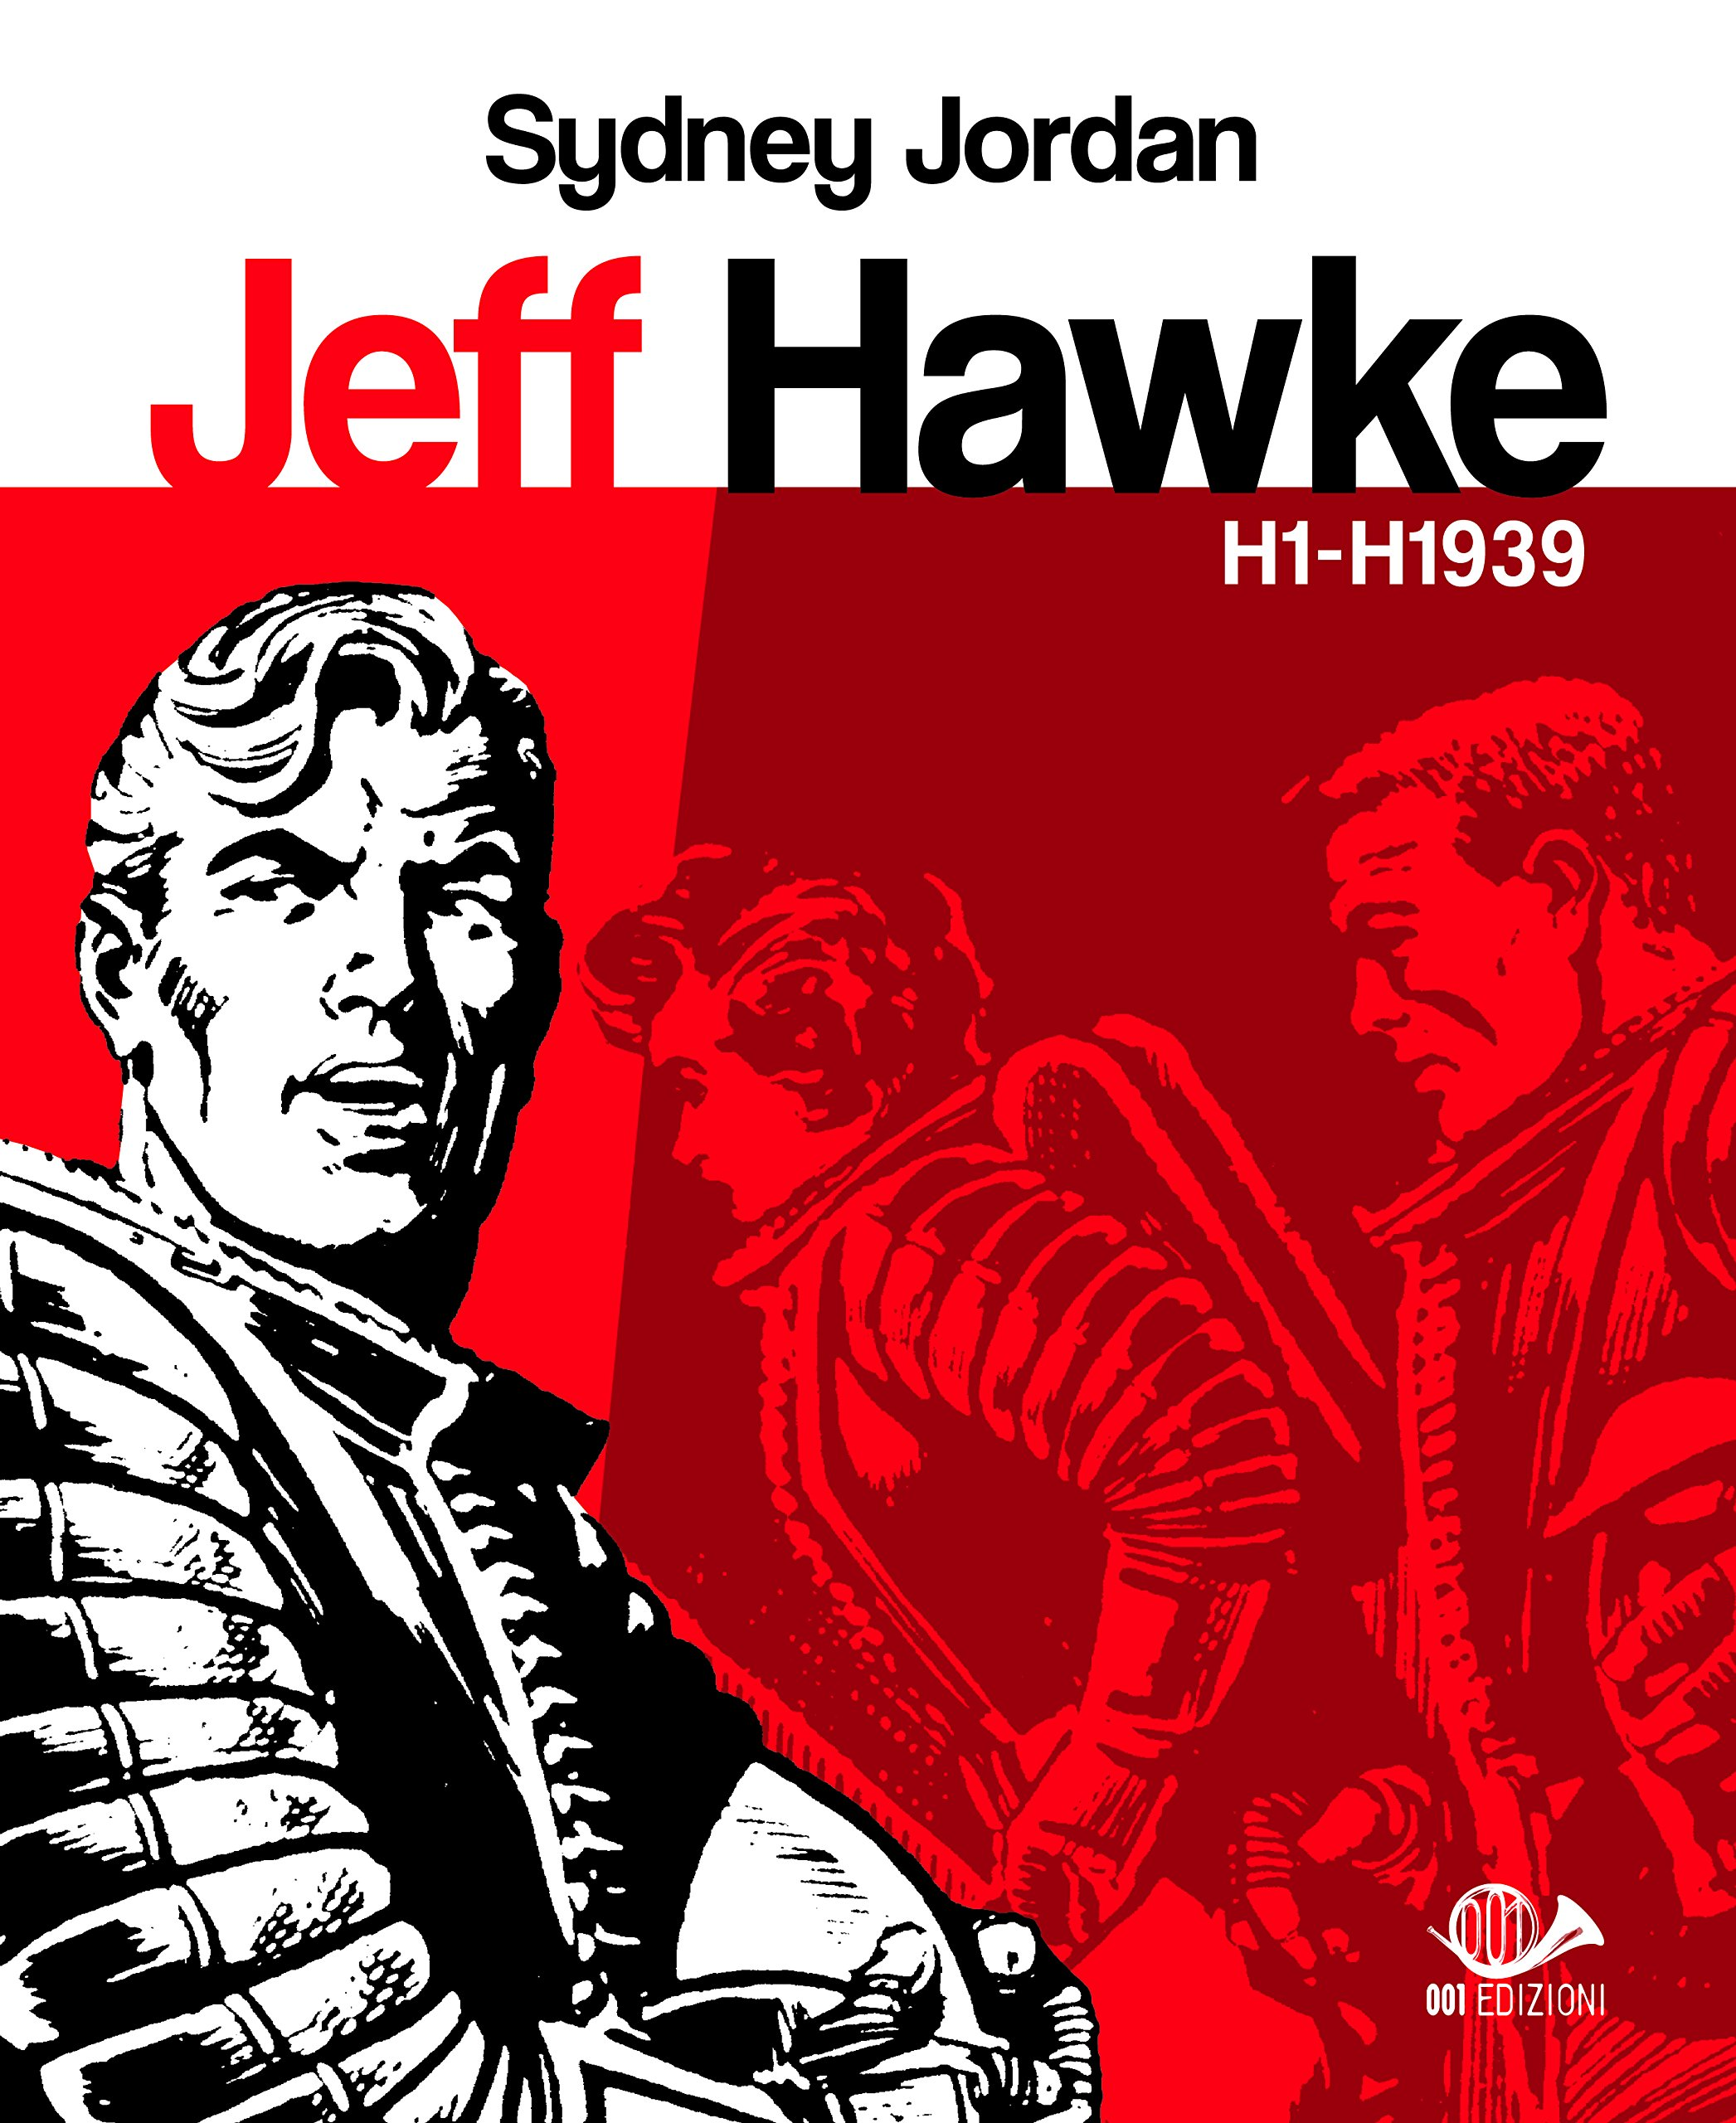 Amazon.it: Jeff Hawke H1 - H1939. H1 - H1939 (Vol. 1) - Sydney Jordan -  Libri